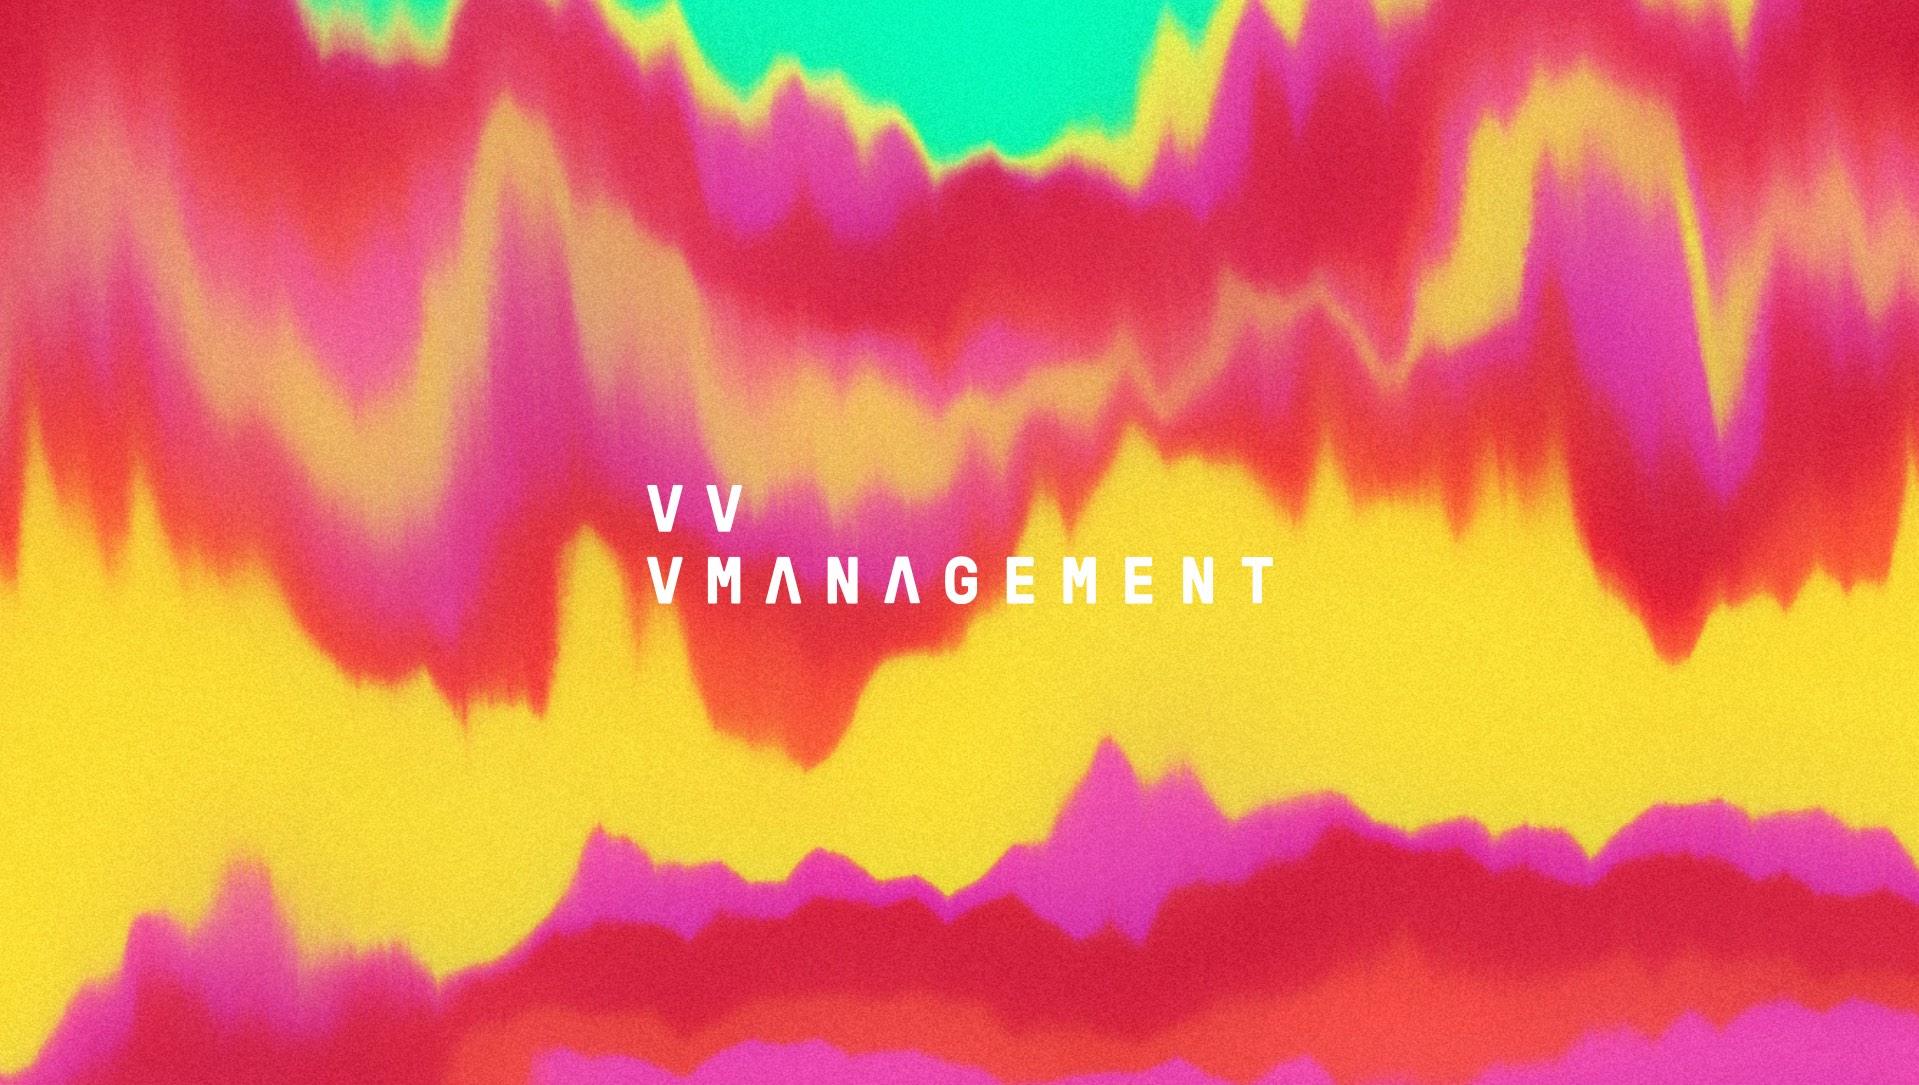 VVV Management